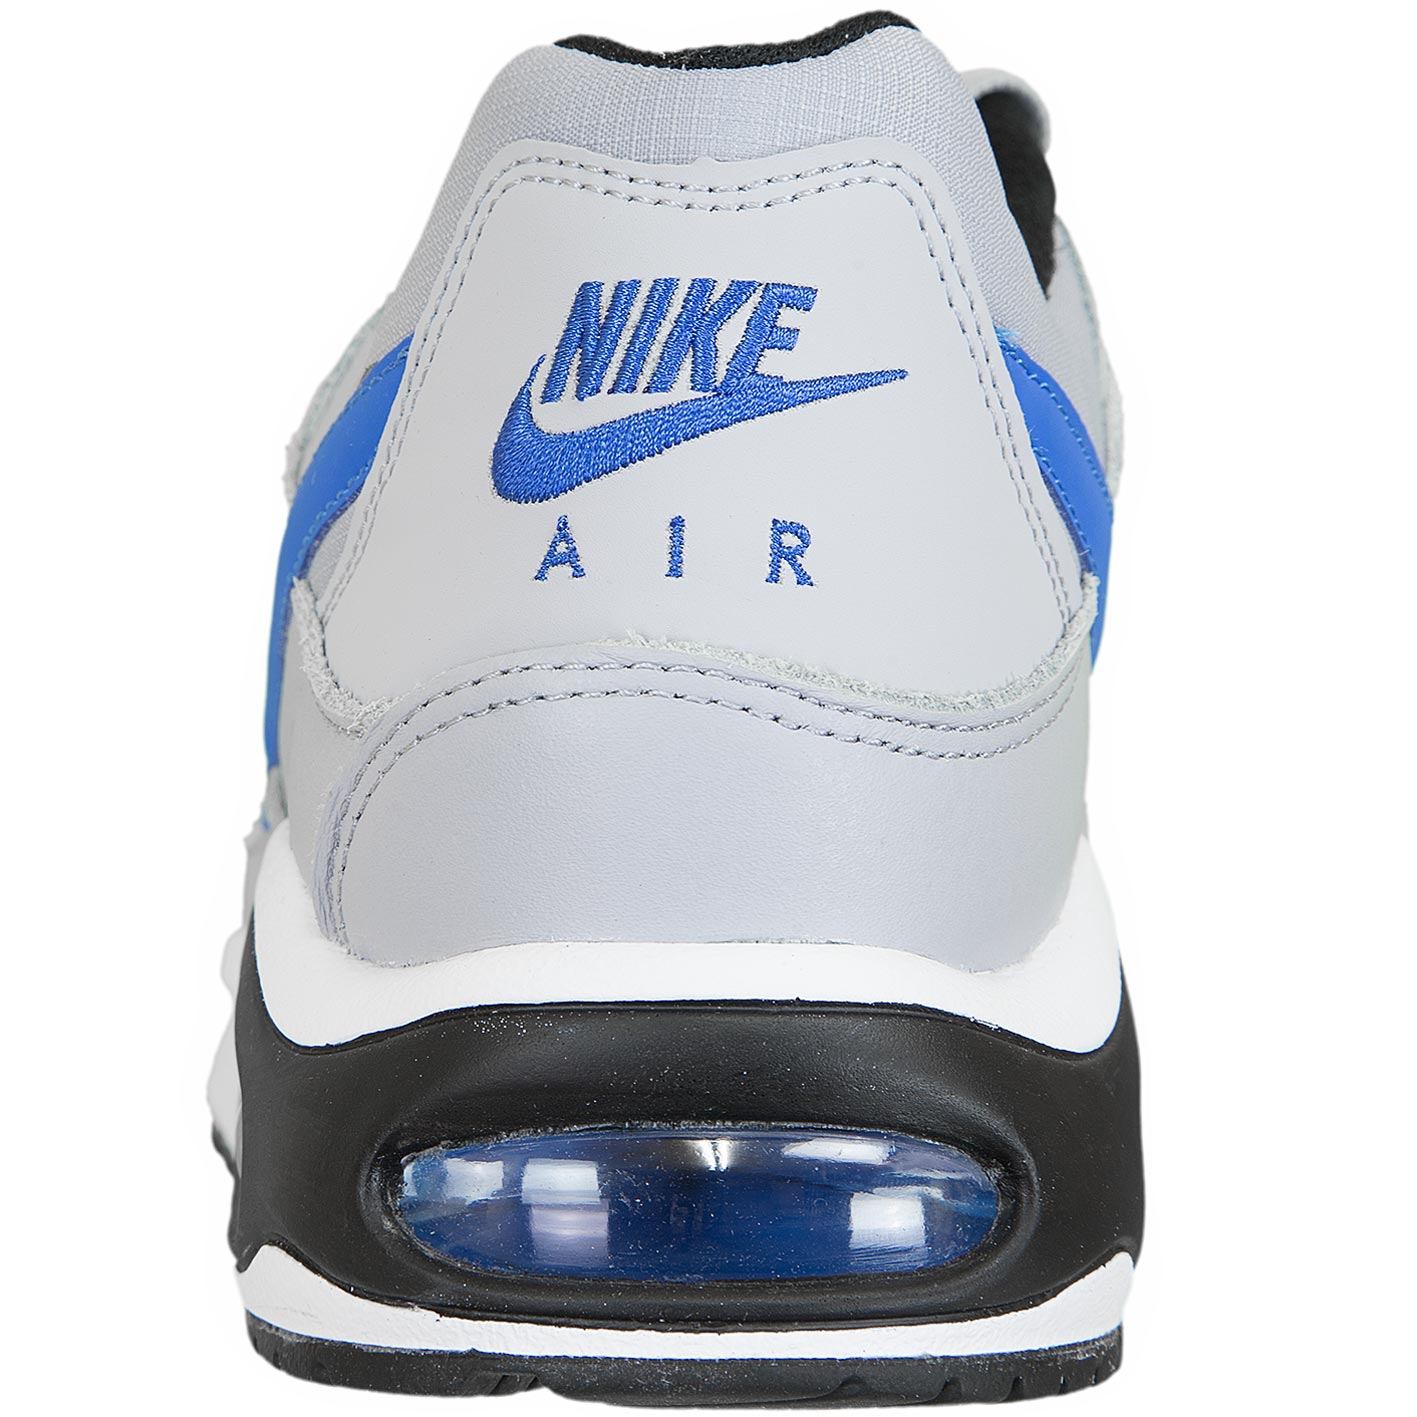 Nike Air Max Command Herren Sneaker grau blau 629993 036